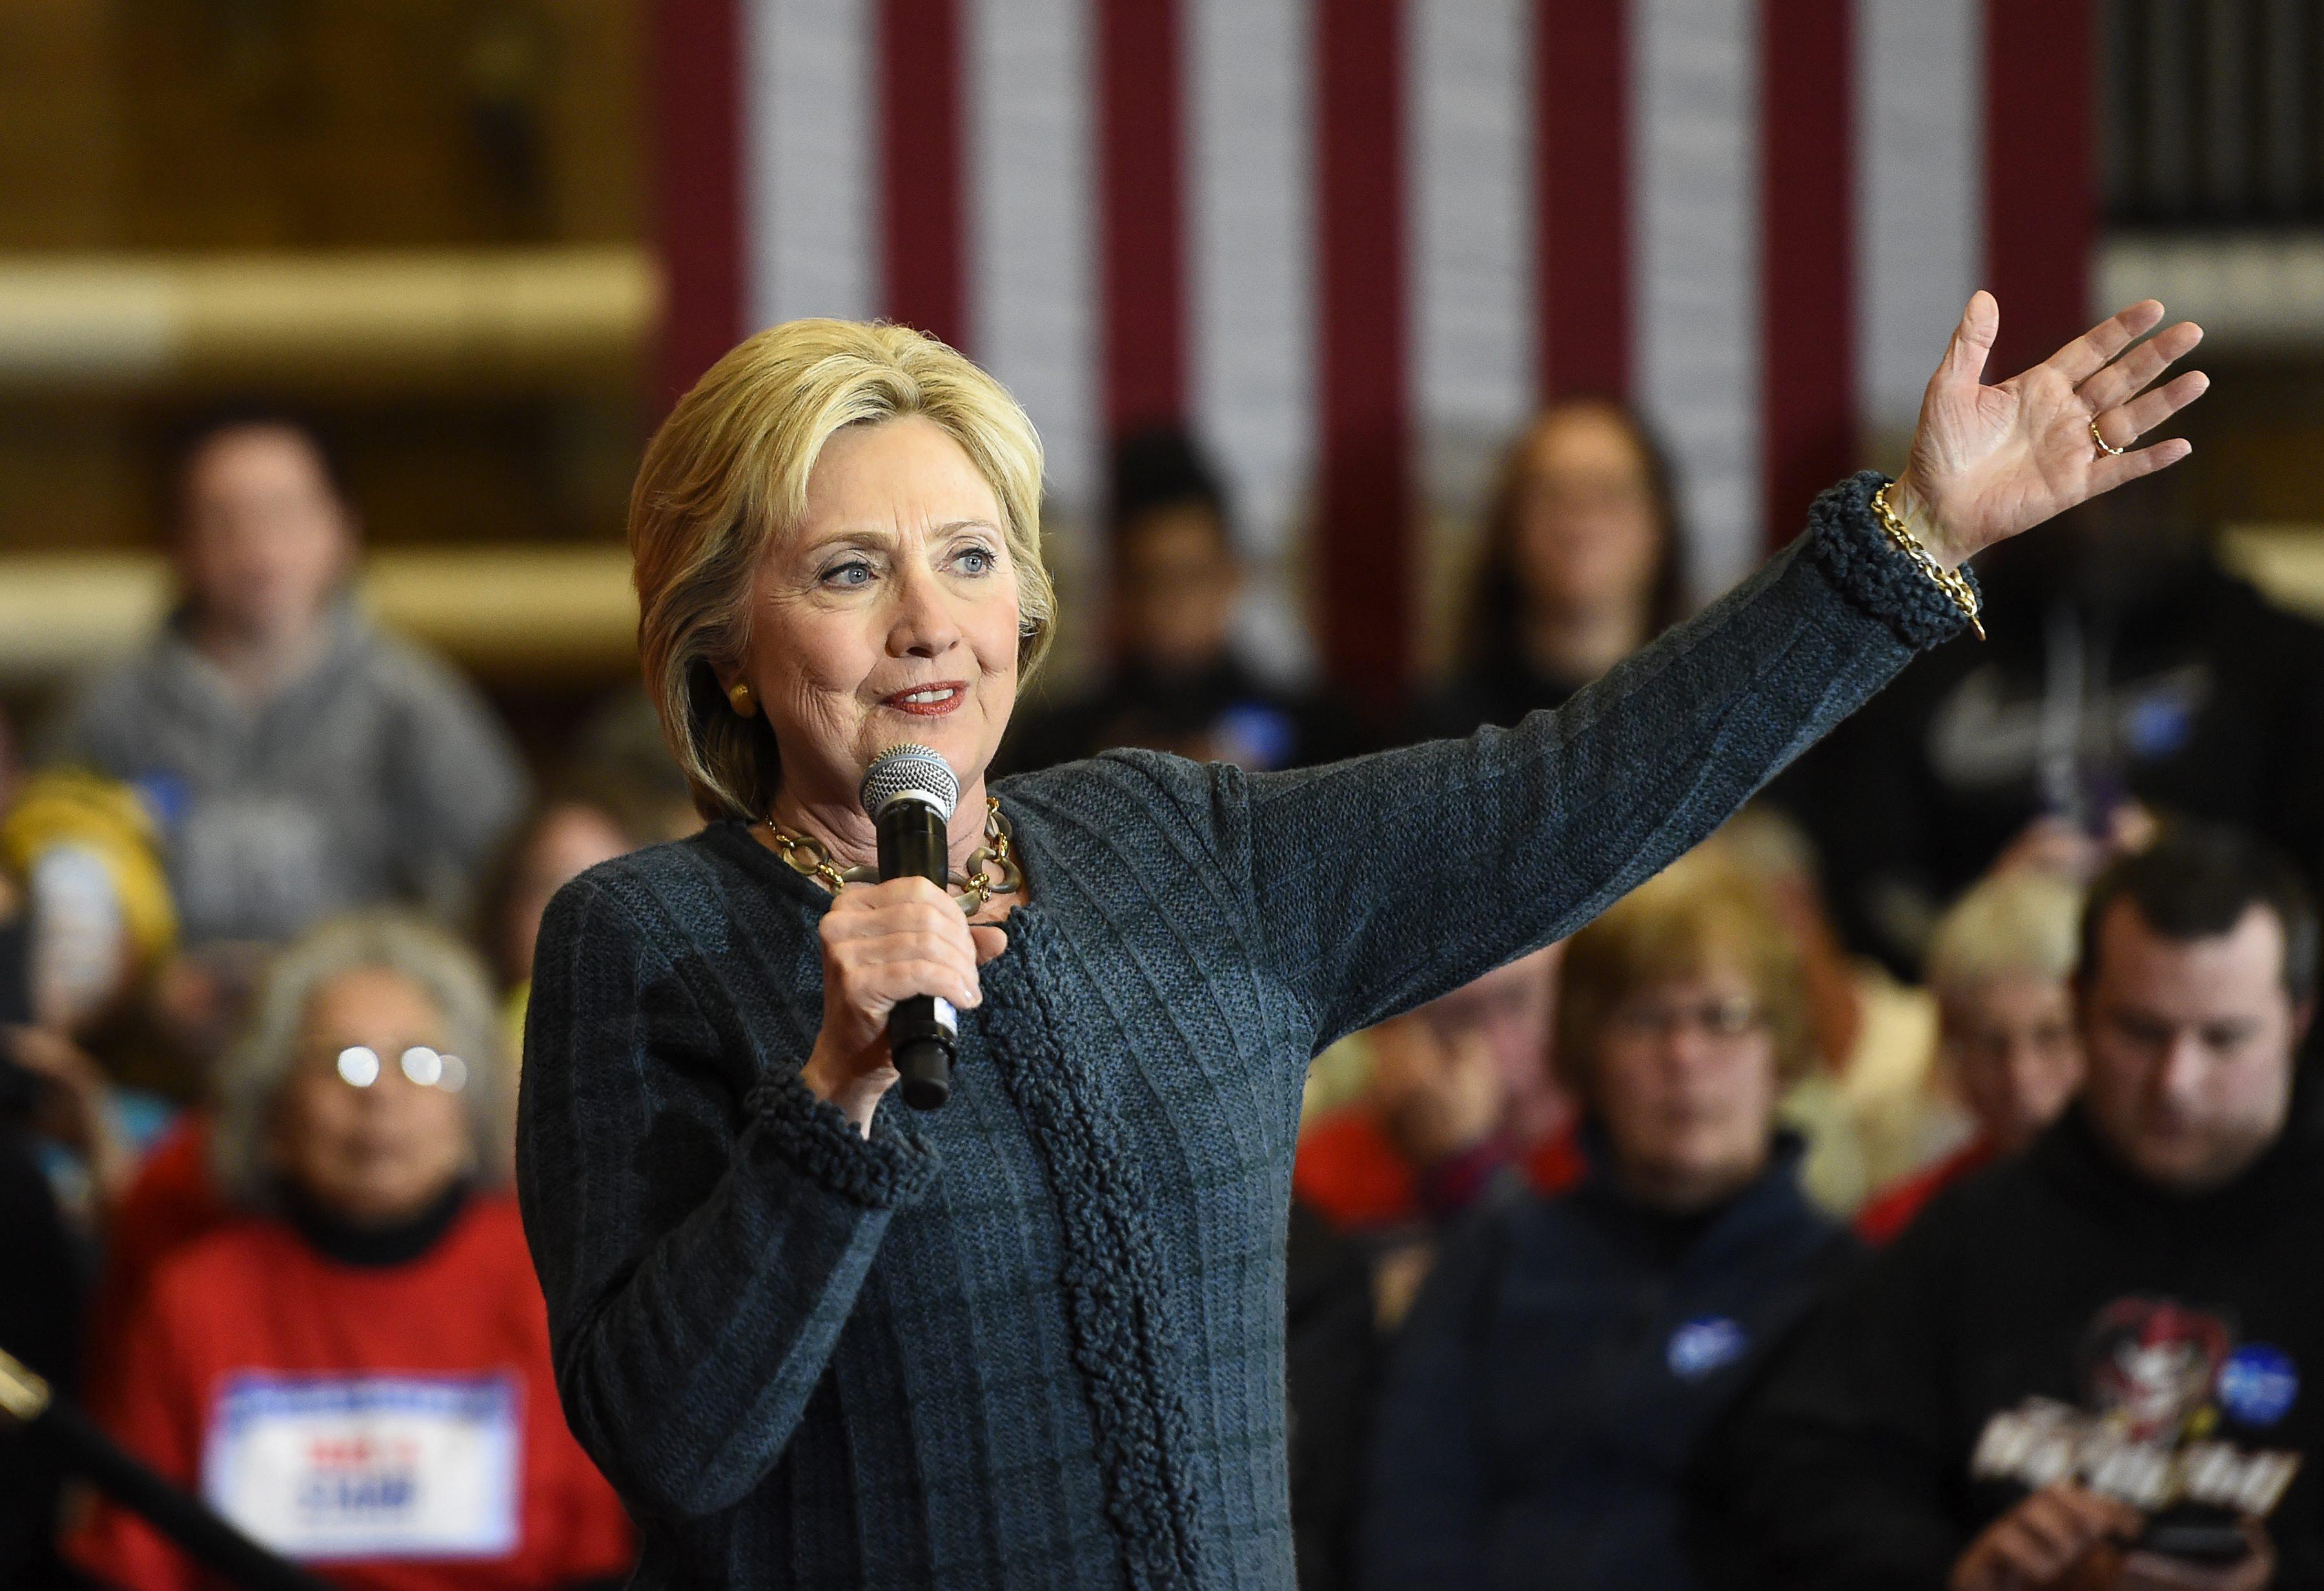 La aspirante a la candidatura demócrata a la presidencia Hillary Clinton